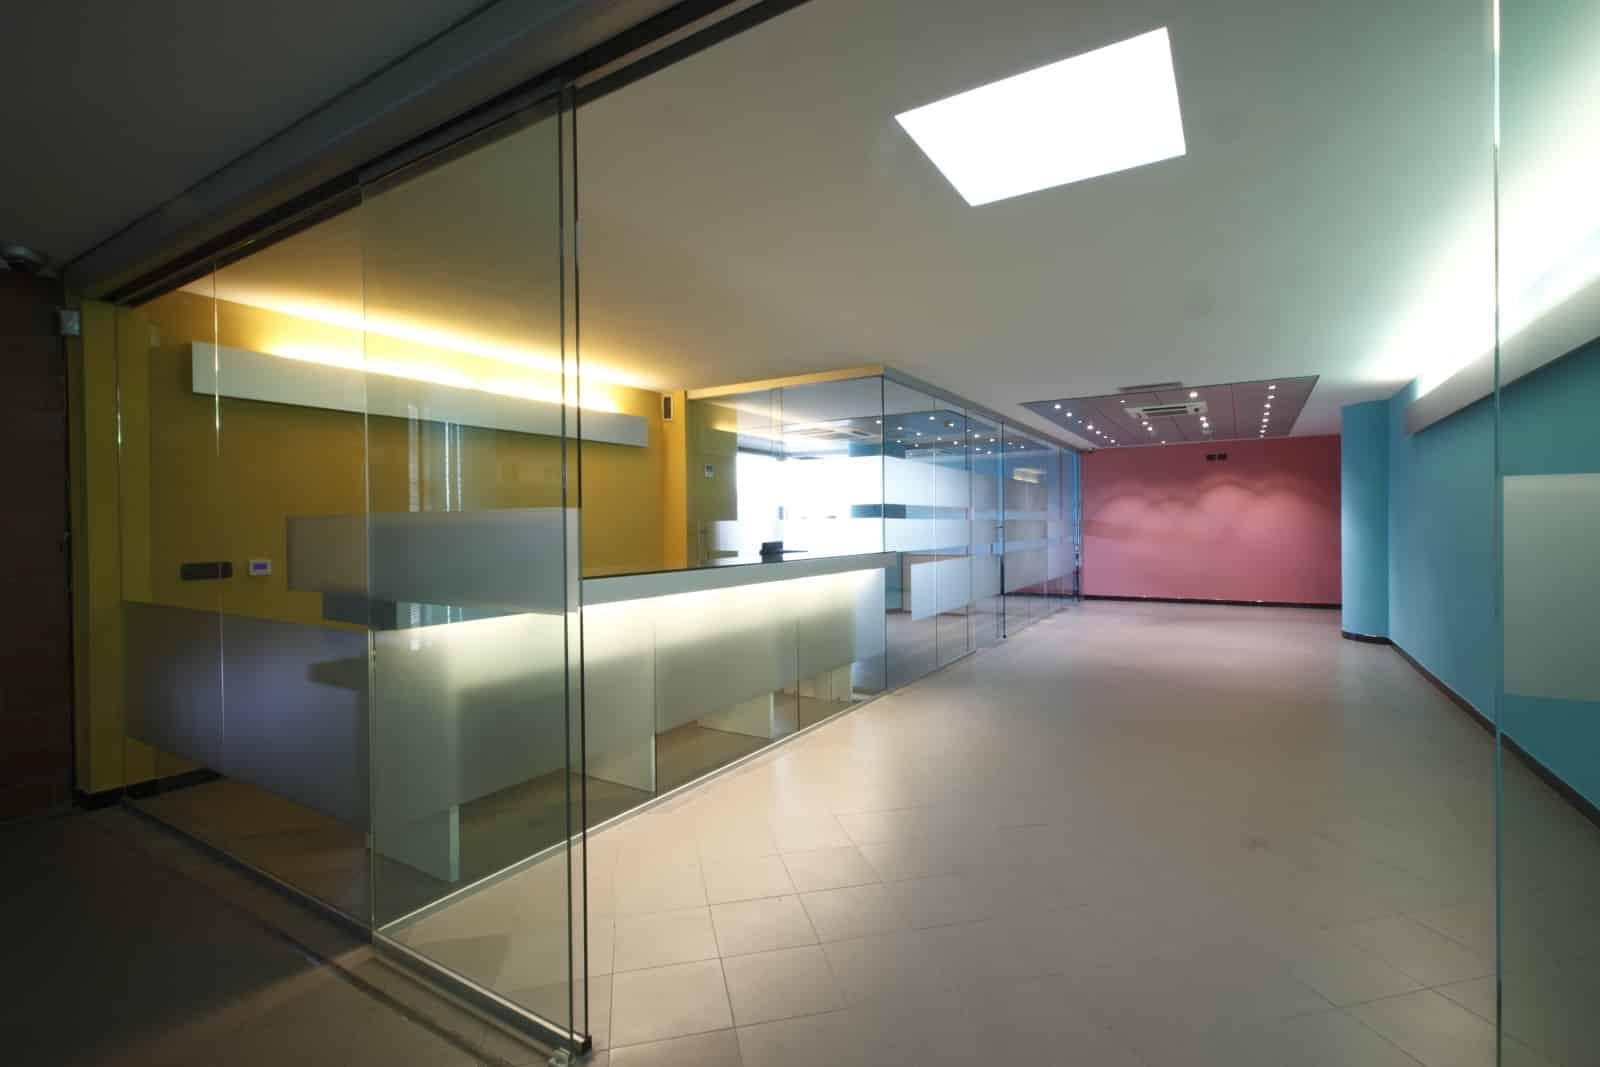 Design of entrance hall and first floor hall of ATAC Patrimonio Headquarter by architect Mario Cutuli